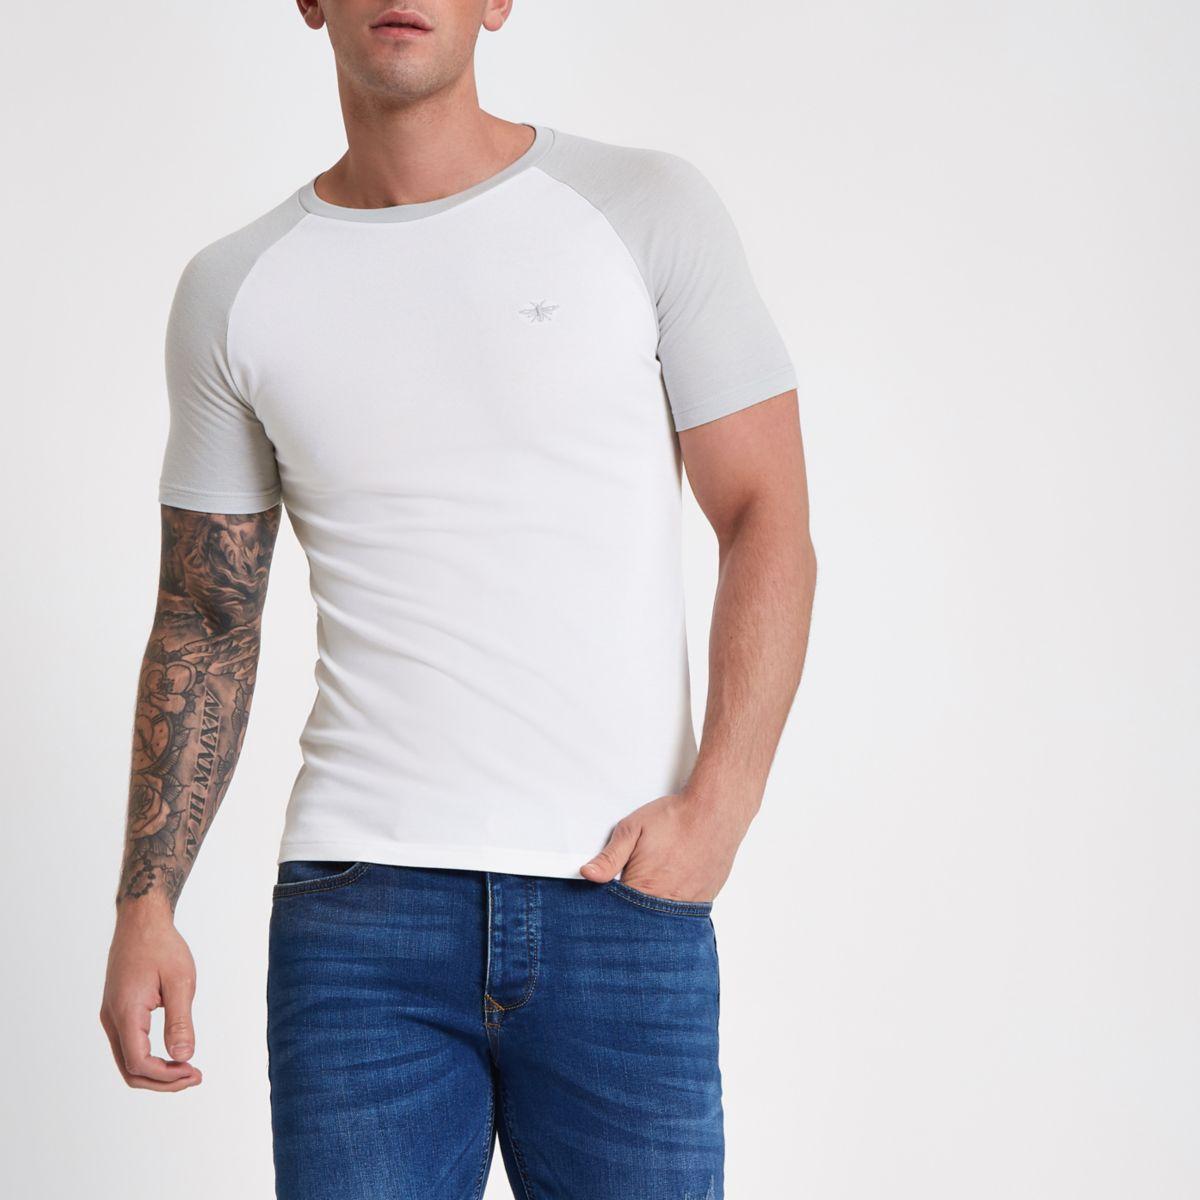 Mens White pique muscle fit raglan T-shirt River Island Pre Order Online Cheap Cost Enjoy For Sale Order Sale Get Authentic kdjetKC